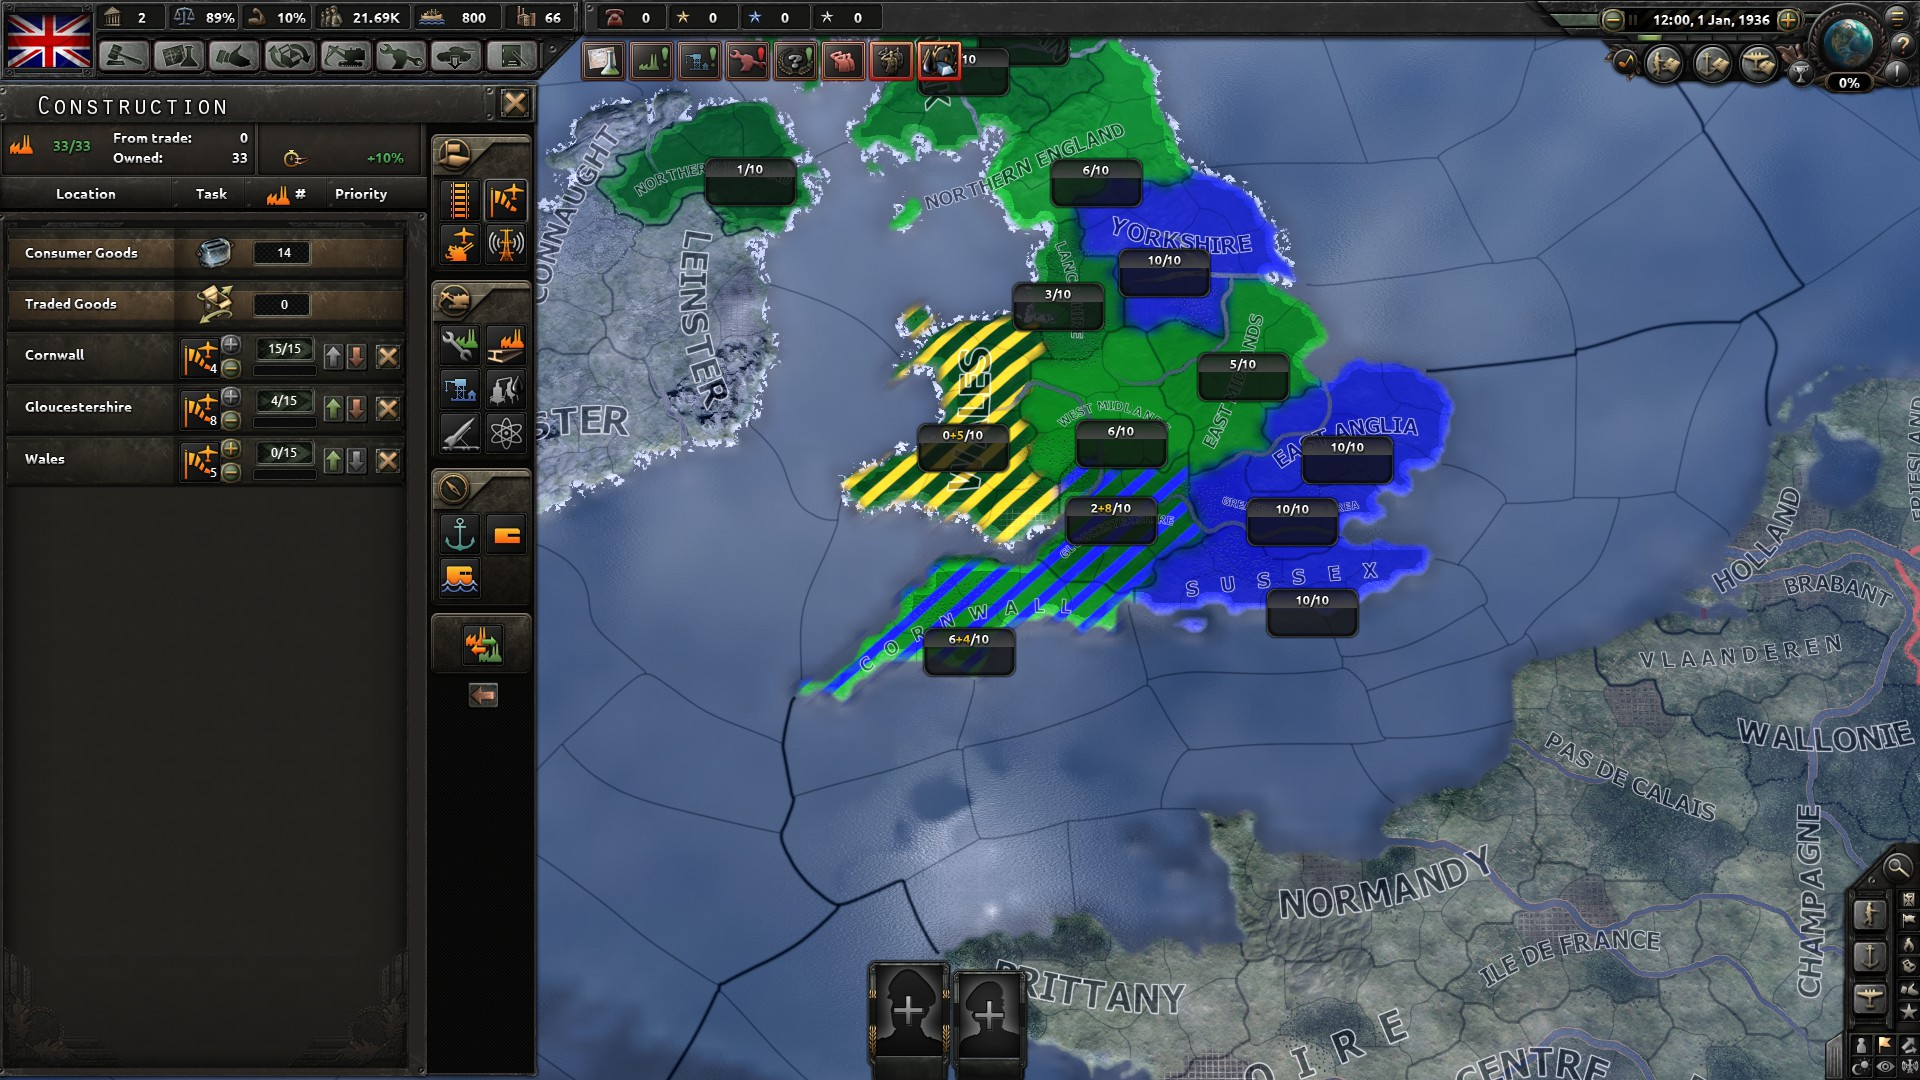 Steam Community :: Guide :: UK MP Guide (Mediocre)